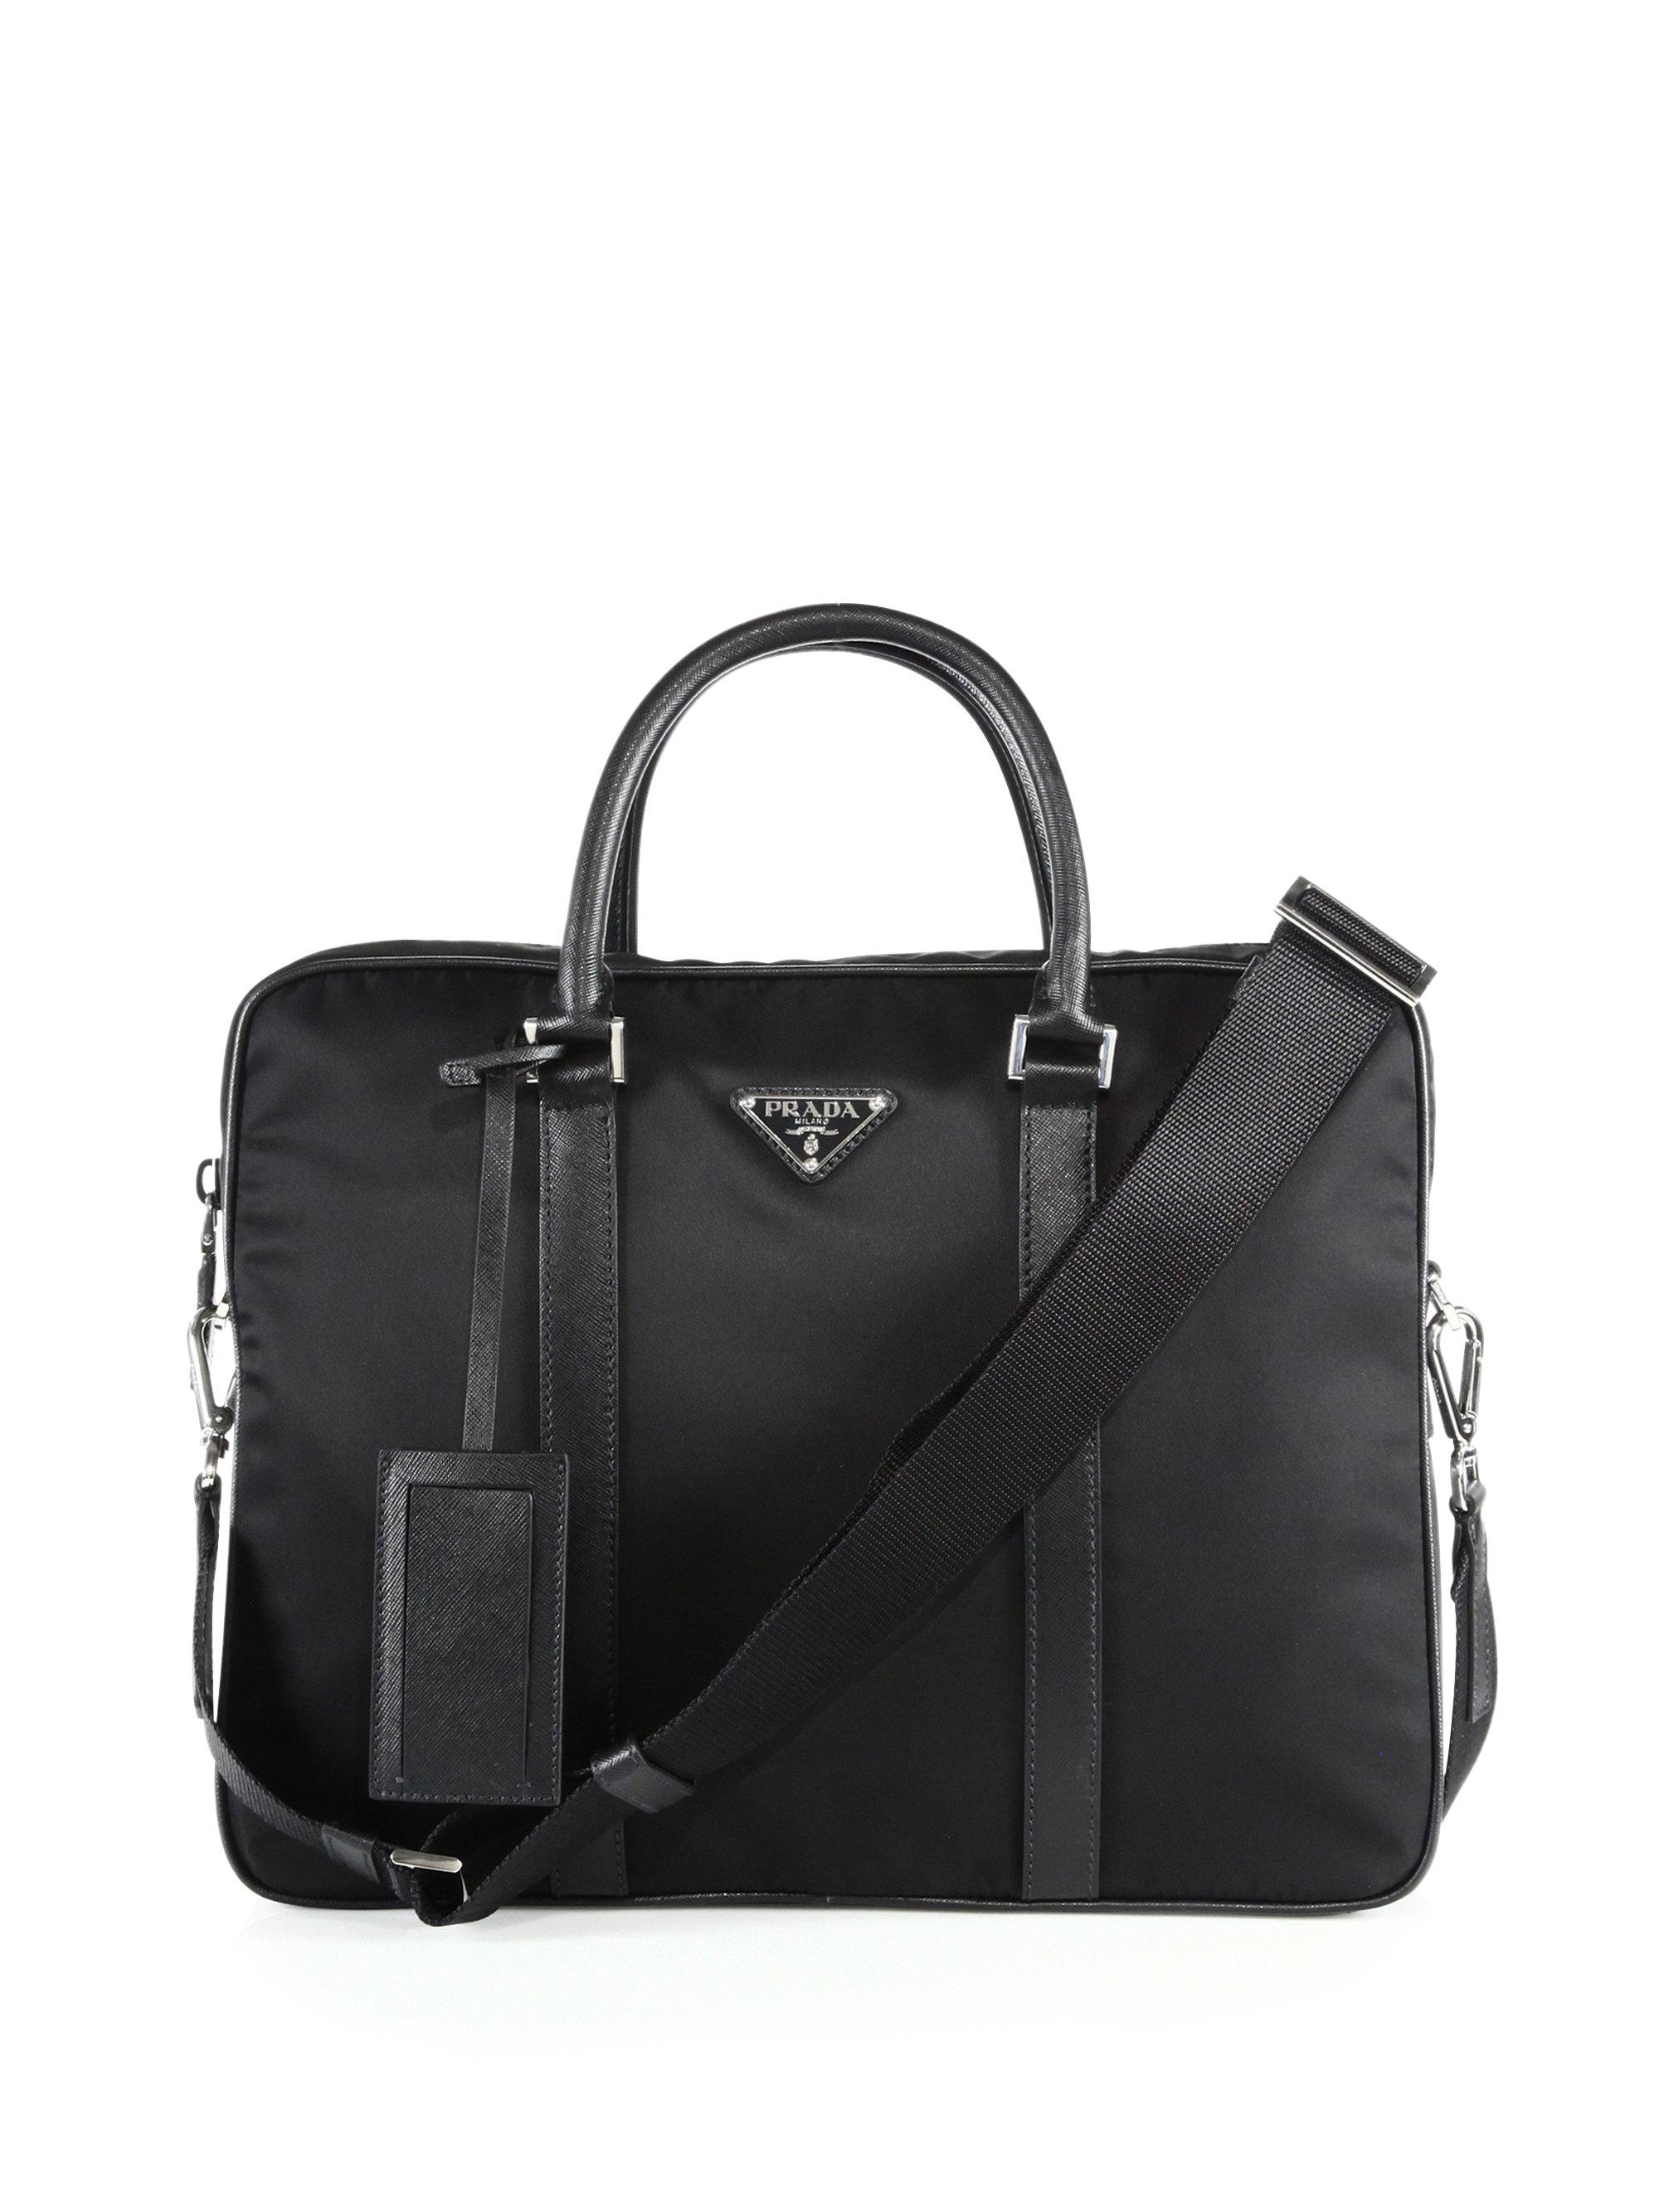 how to tell a real prada purse - Prada Borsa Da Lavoro Briefcase in Black for Men | Lyst